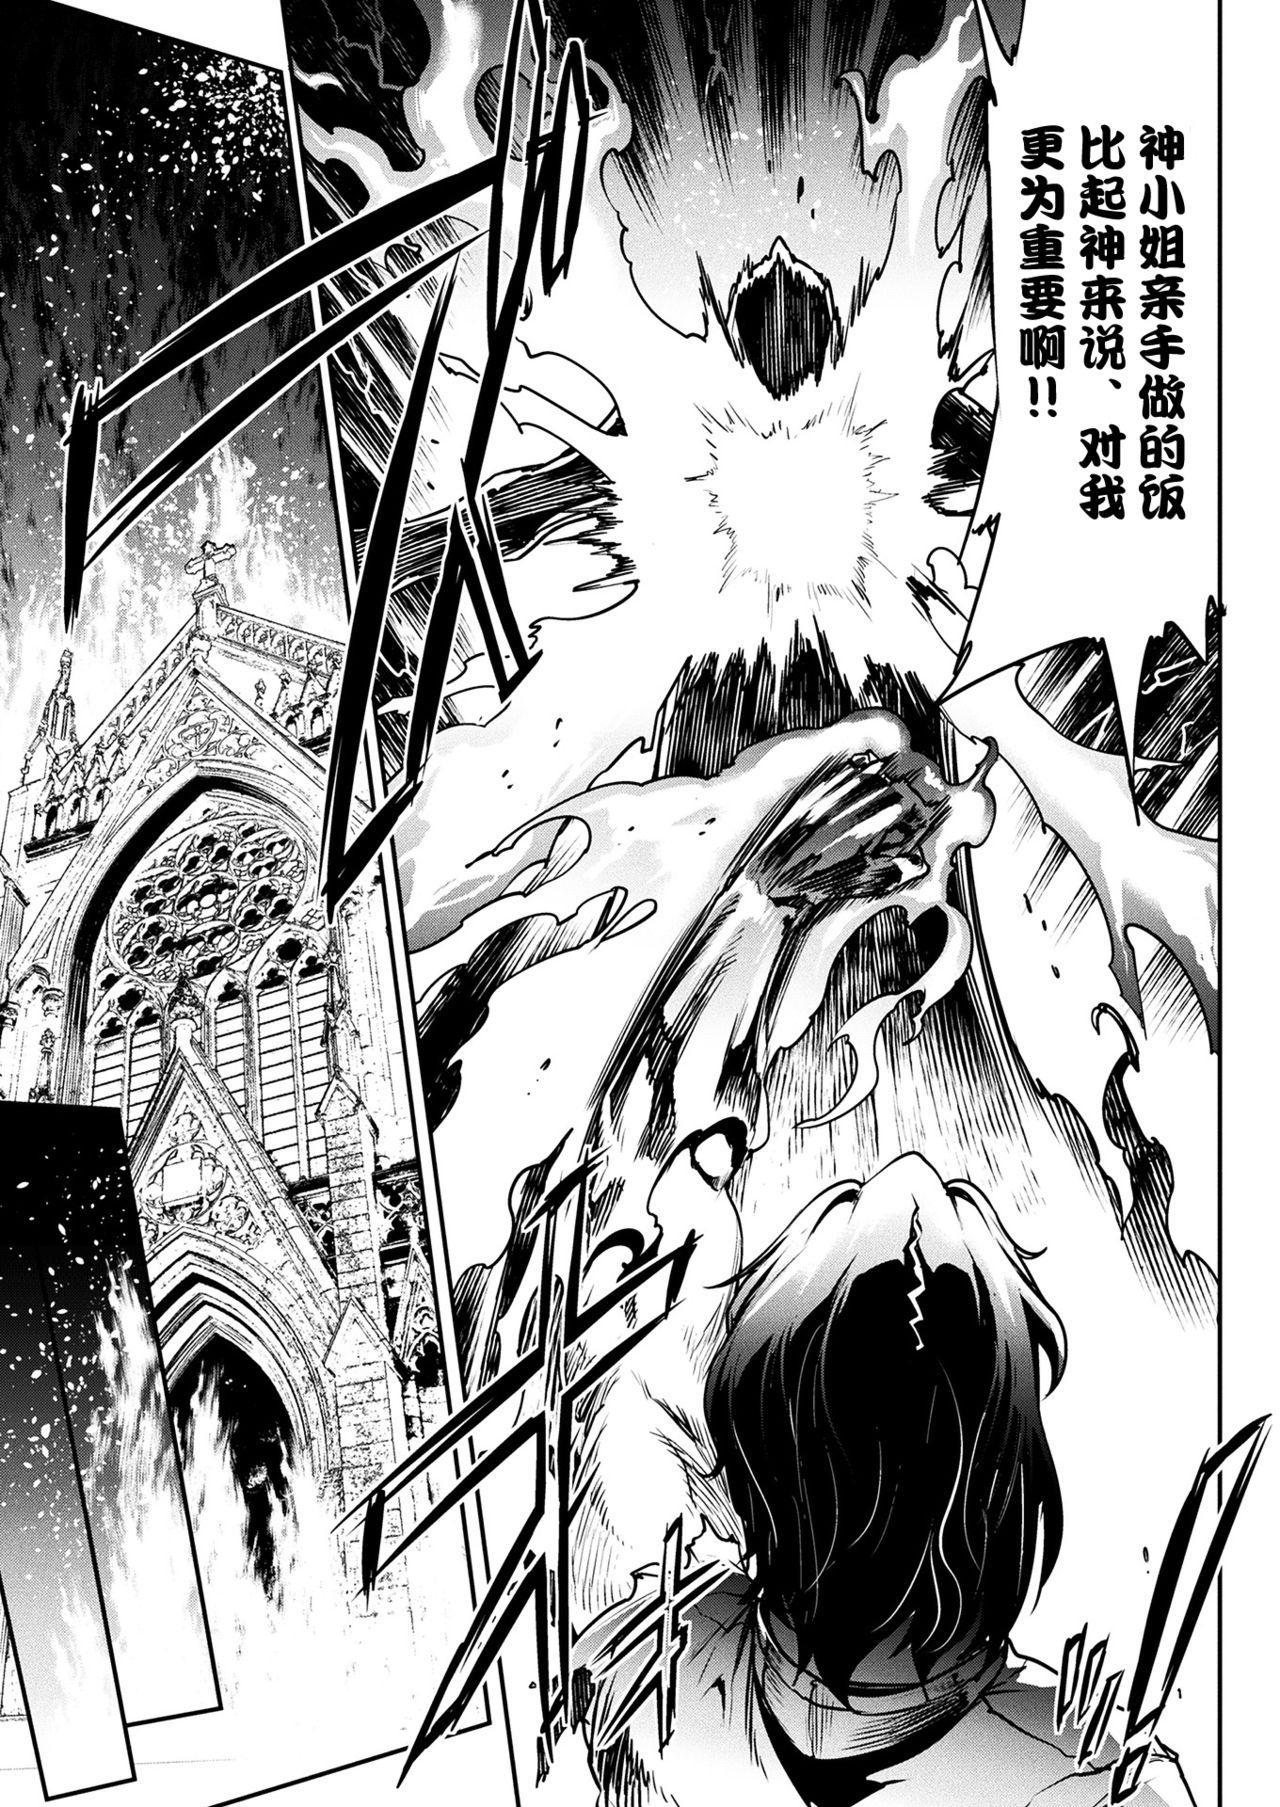 [Erect Sawaru] Raikou Shinki Igis Magia -PANDRA saga 3rd ignition- Ch. 24 (COMIC Unreal 2020-08 Vol. 86) [Chinese] [不咕鸟汉化组] [Digital] 24